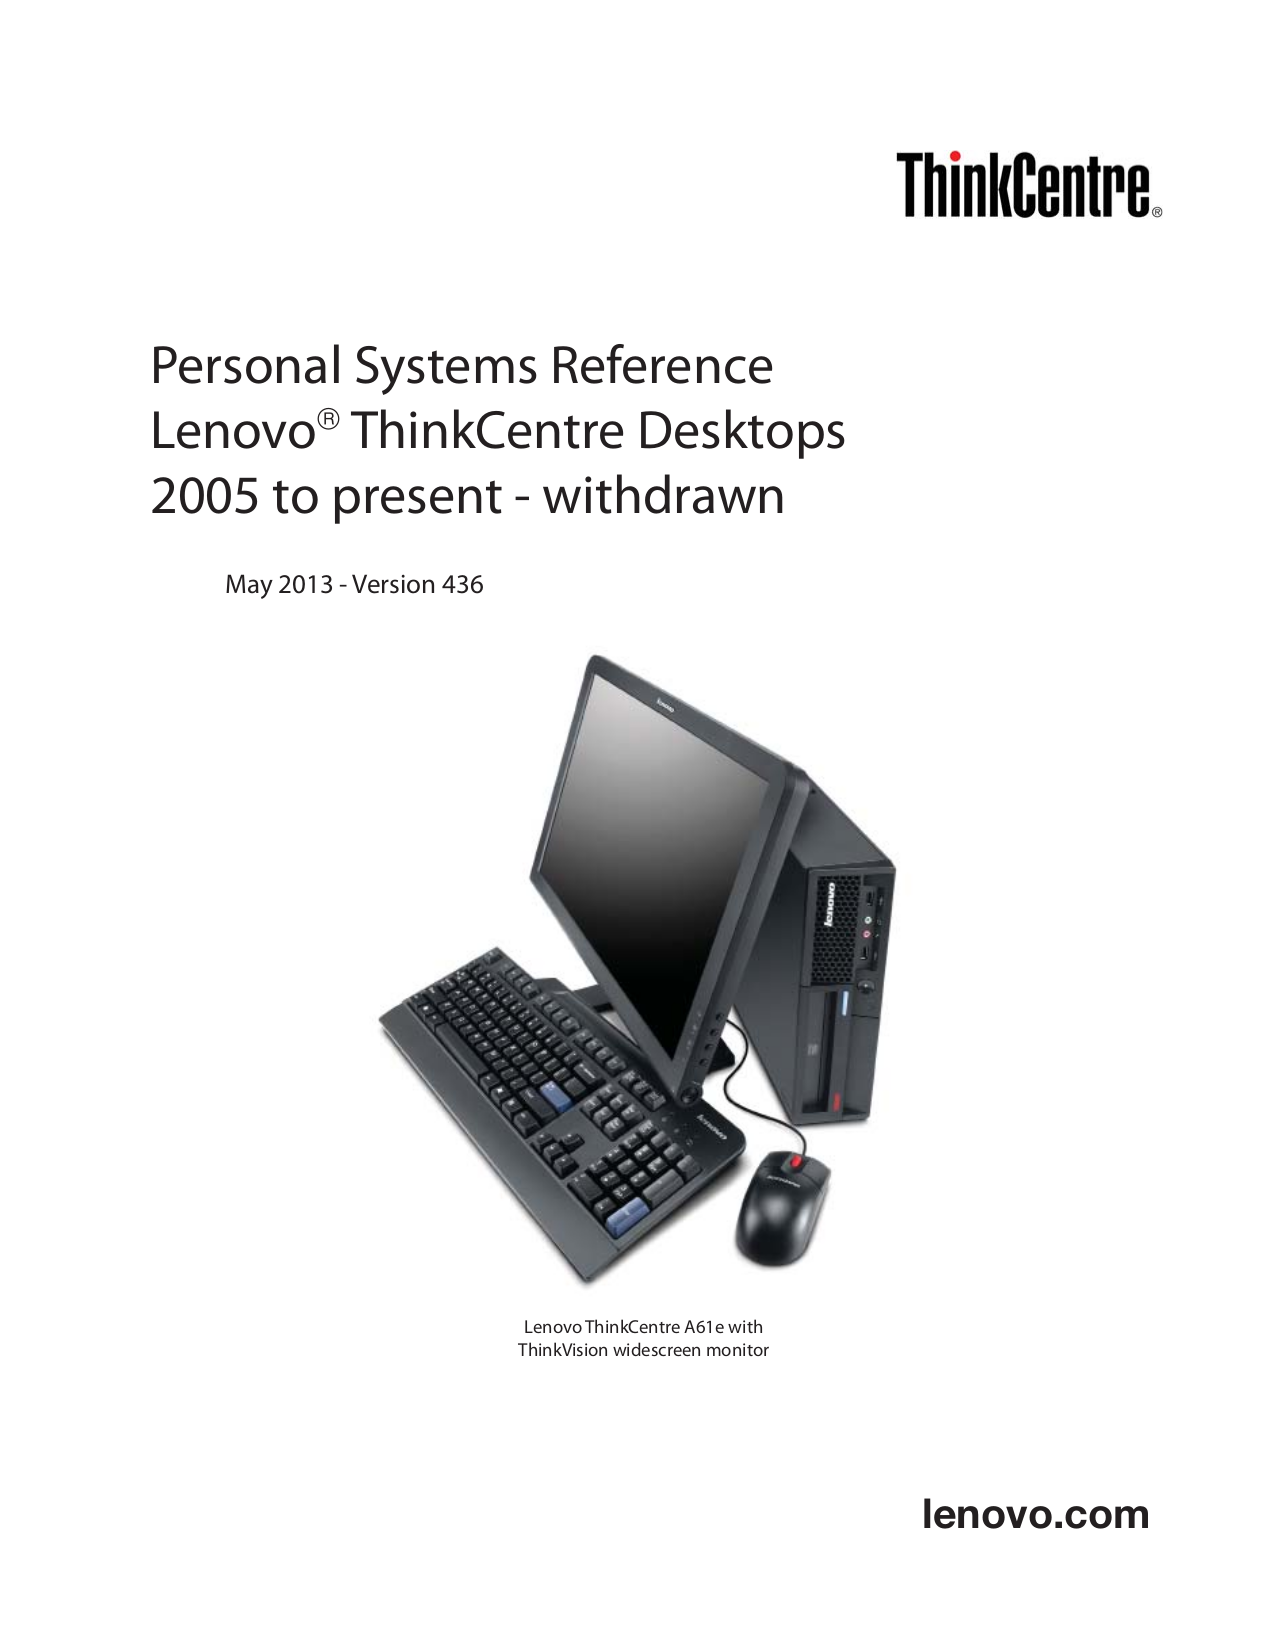 pdf for Lenovo Desktop ThinkCentre M57e 6178 manual